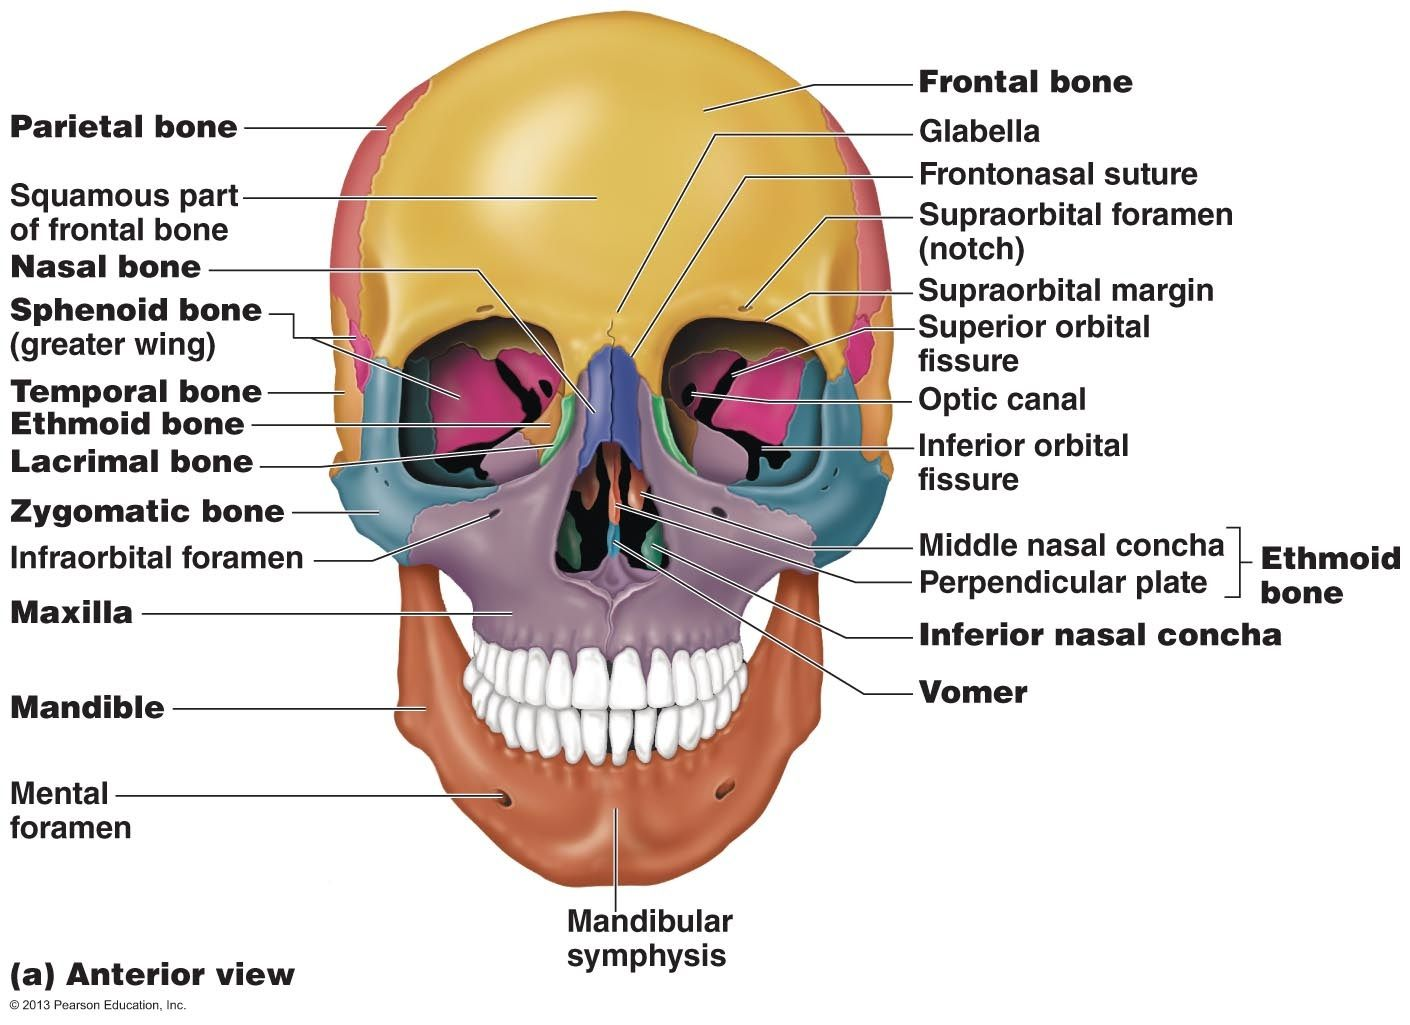 Human Anatomy Pearson Blank Skull Human Skull Anatomy Diagram Anatomy Human Skull Human Anatomy Skull Anatomy Axial Skeleton Human Skull Anatomy